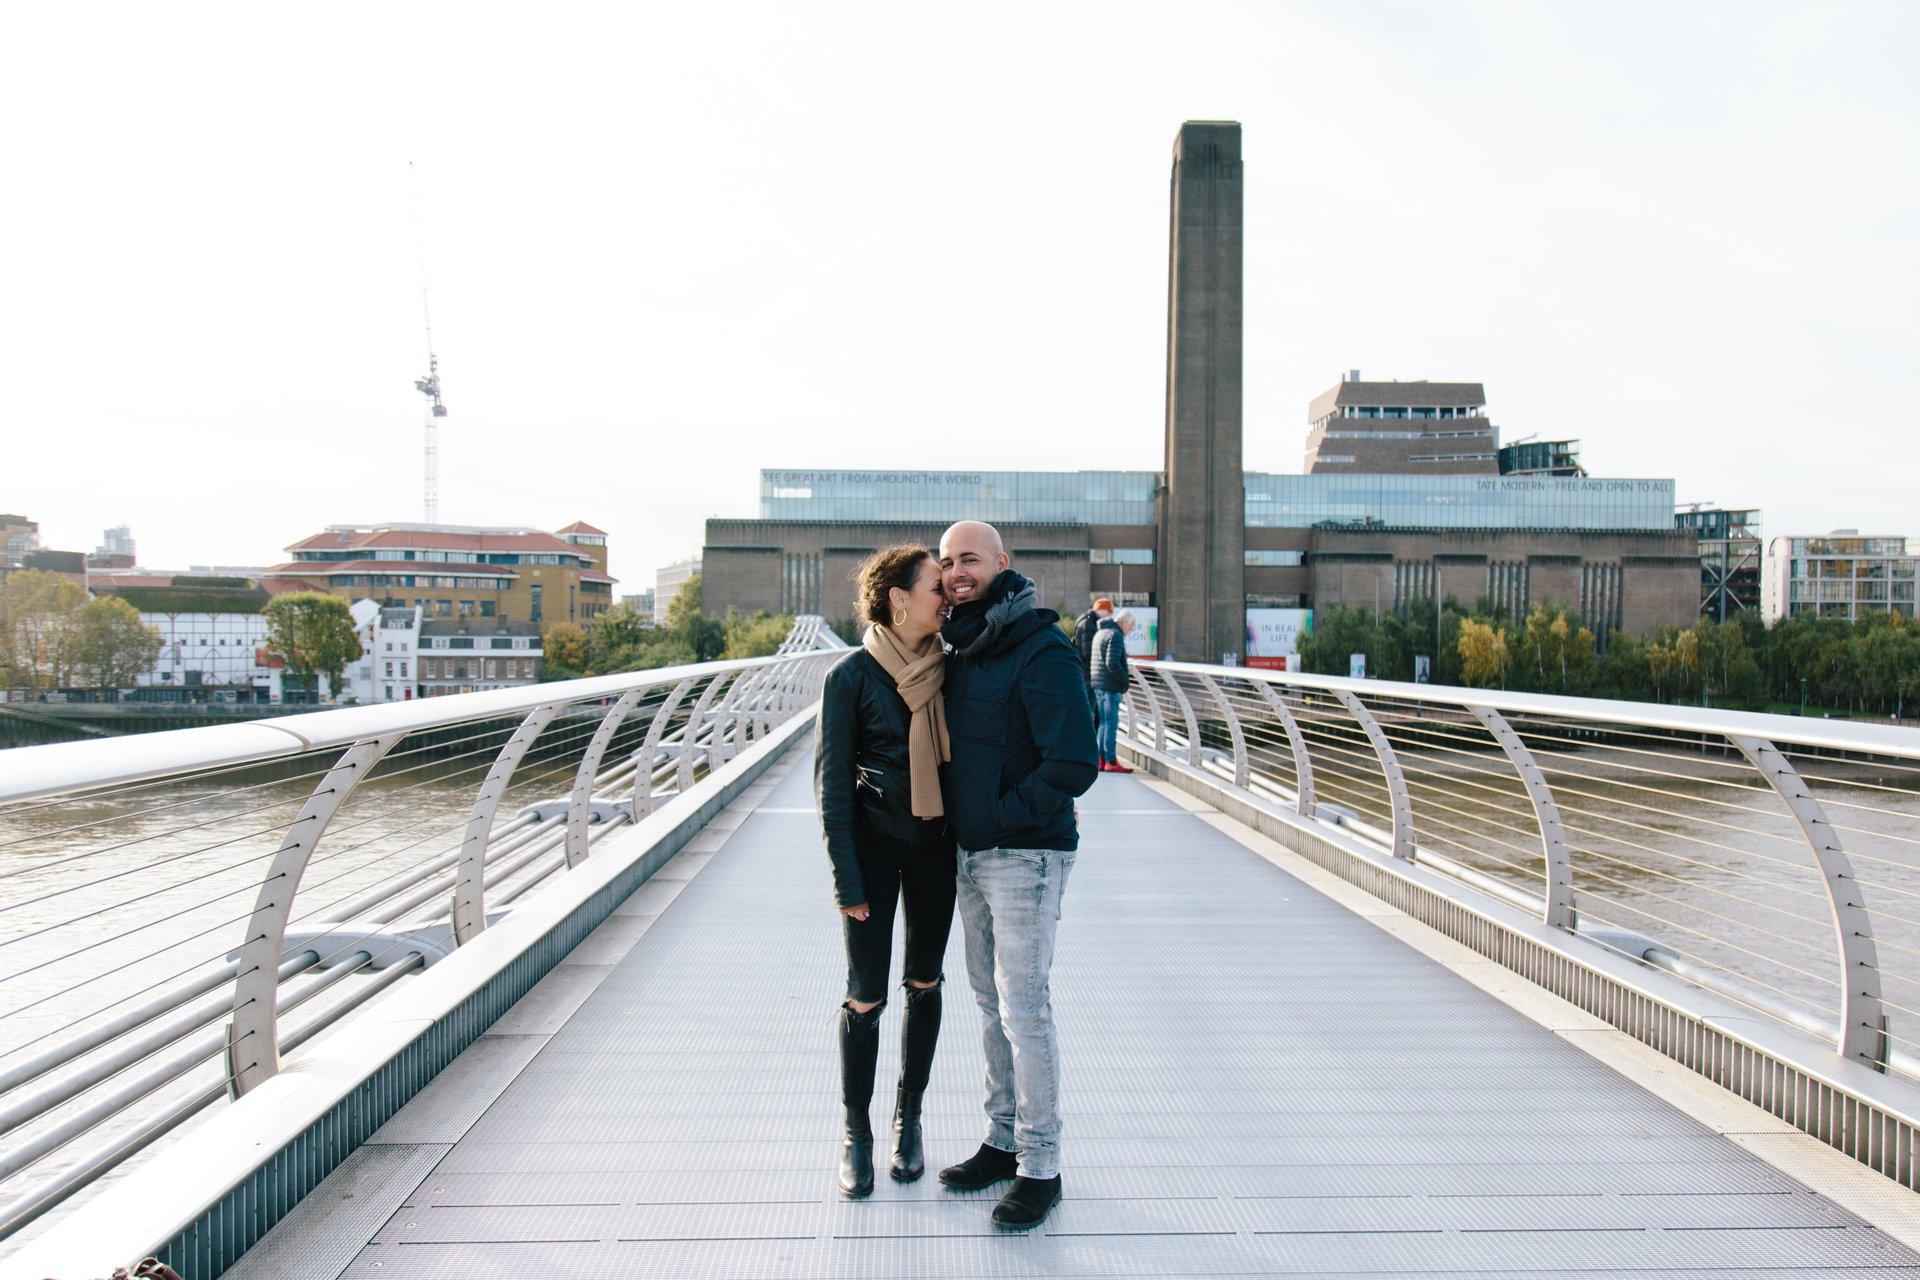 London-UK-travel-story-Flytographer-14